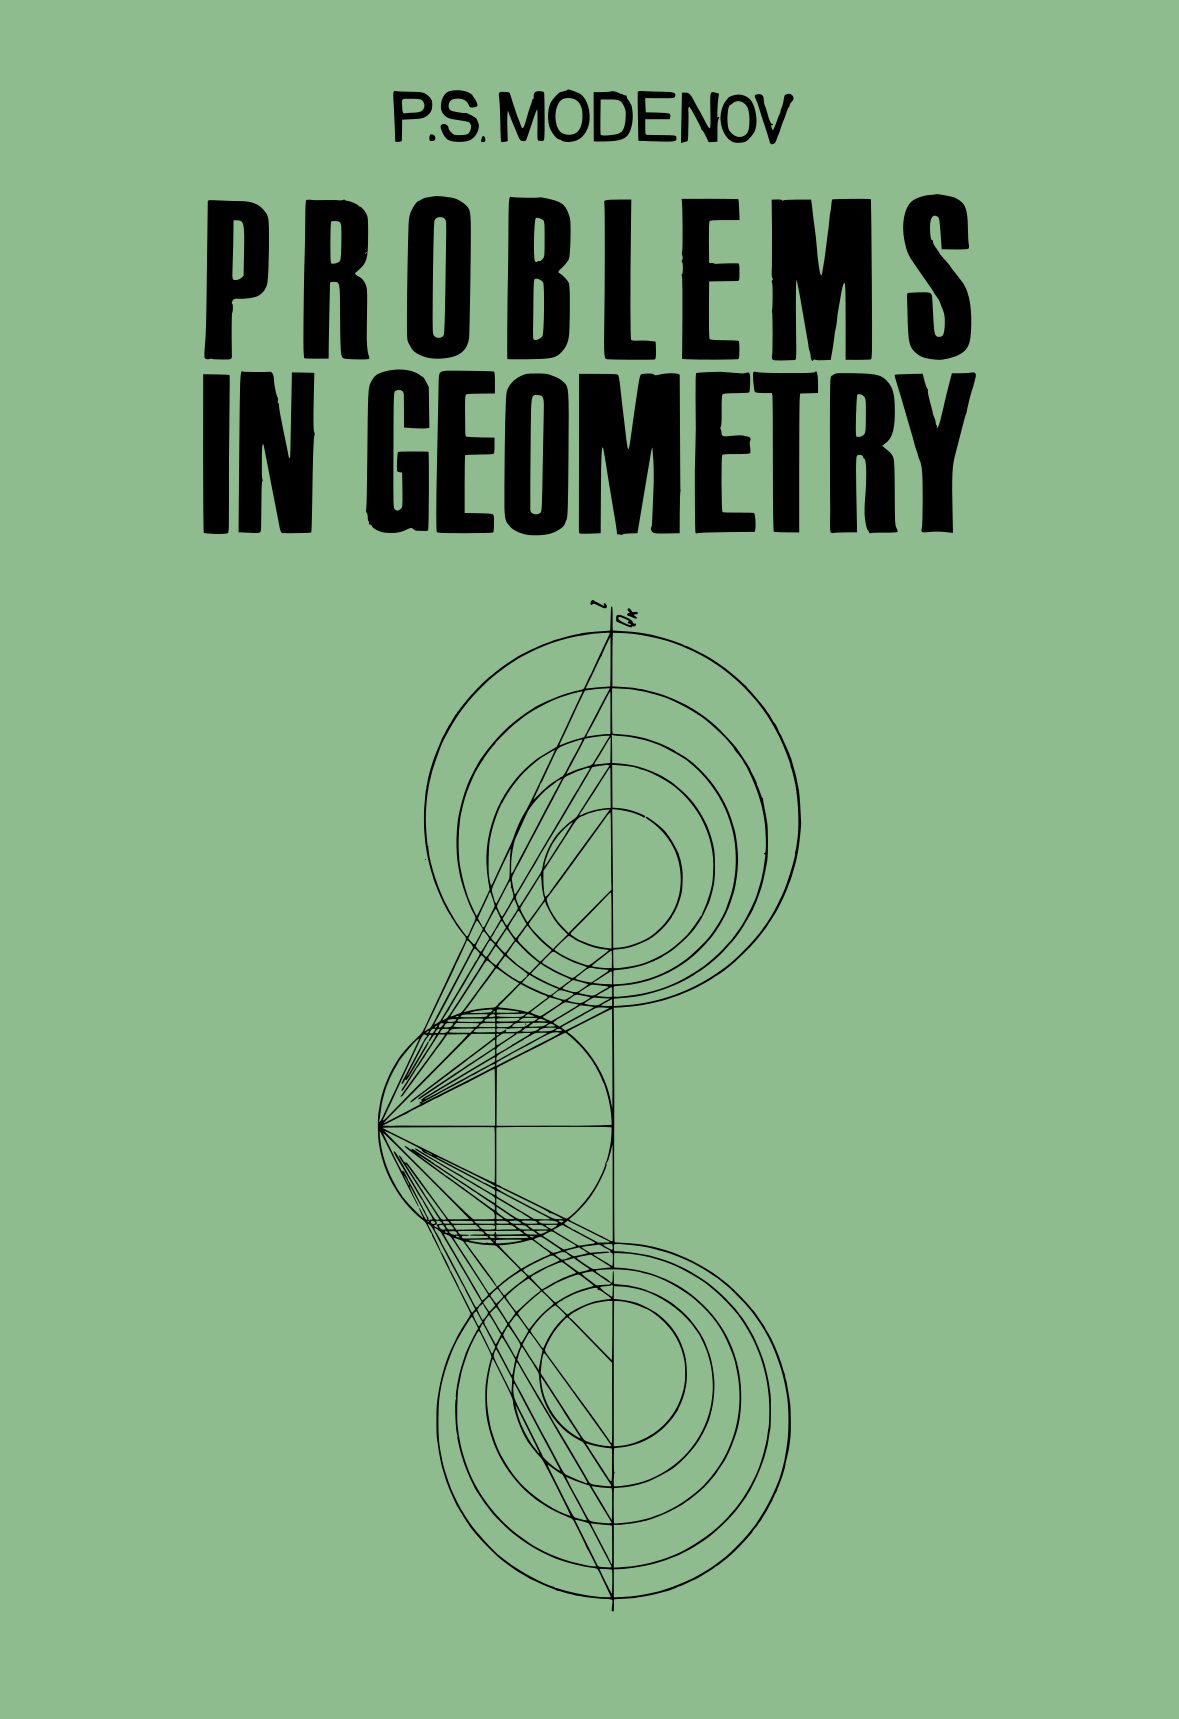 Kiselevs Geometry Pdf